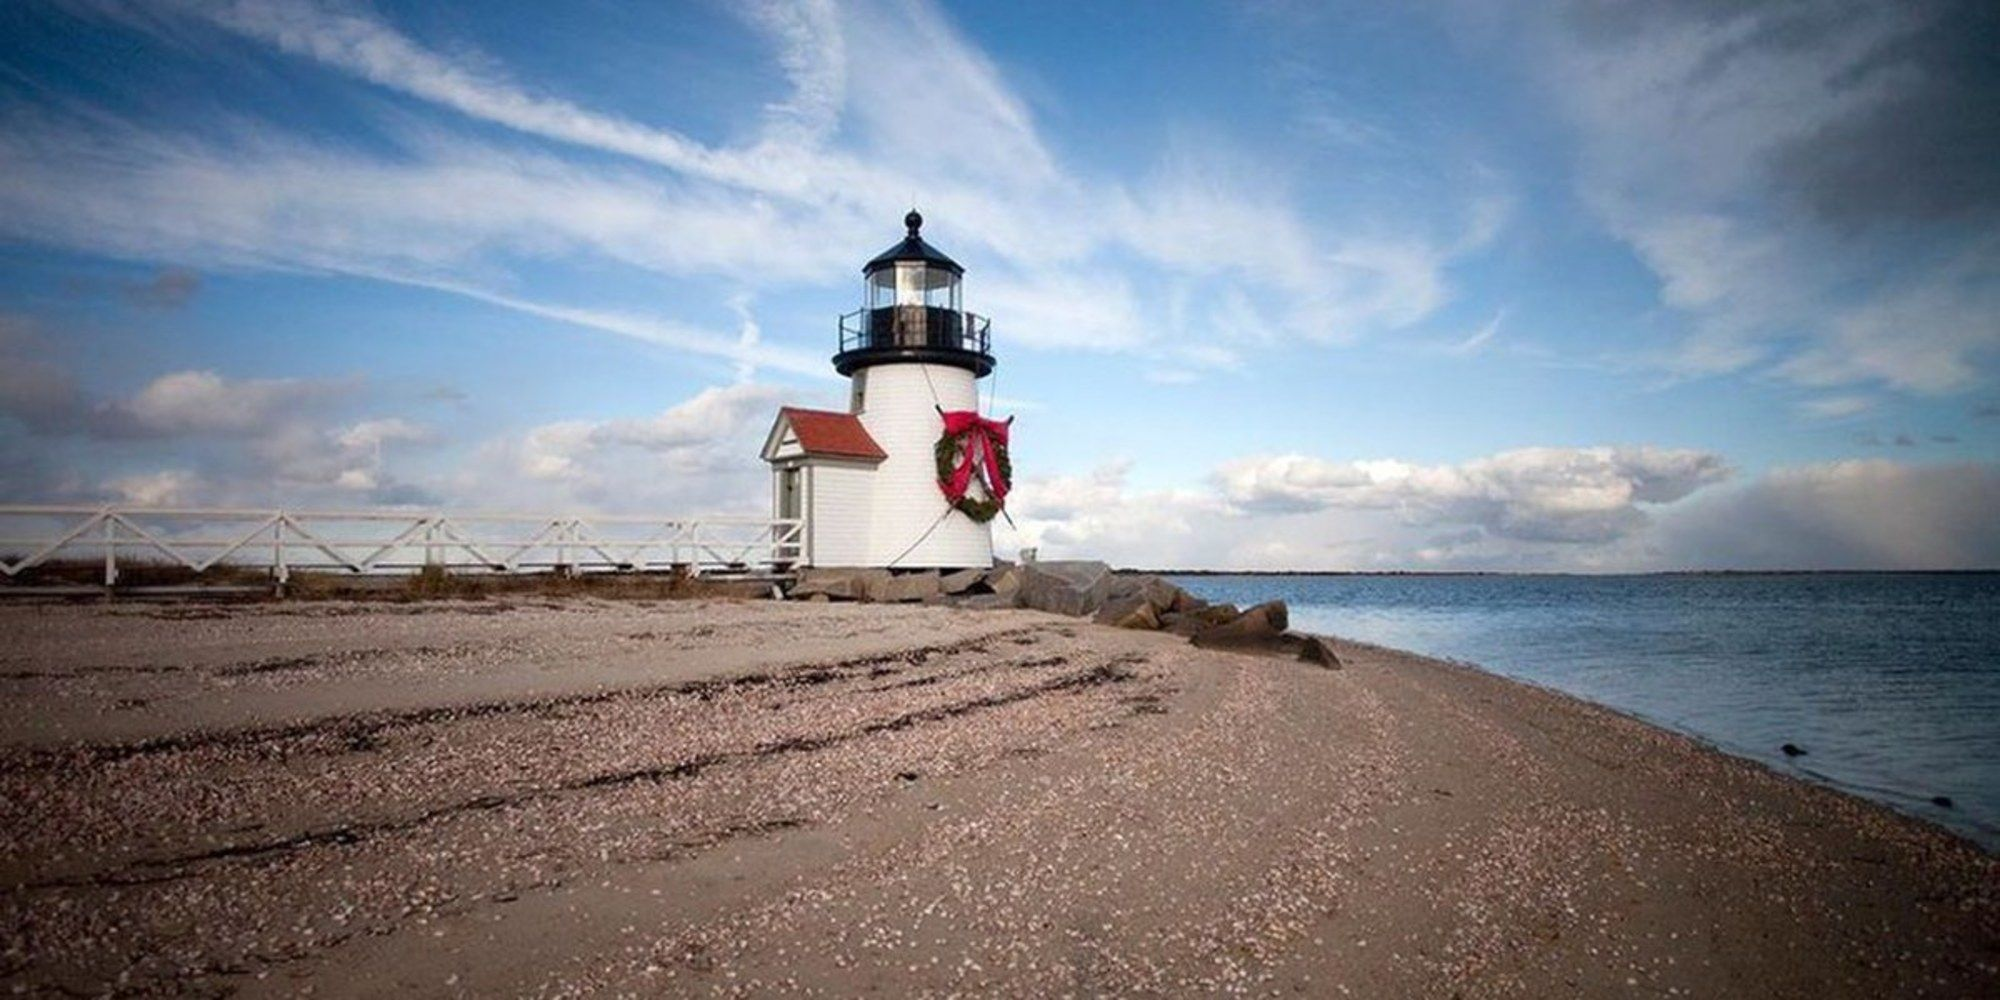 5 Islands Worth Visiting During the OffSeason Honeymoon